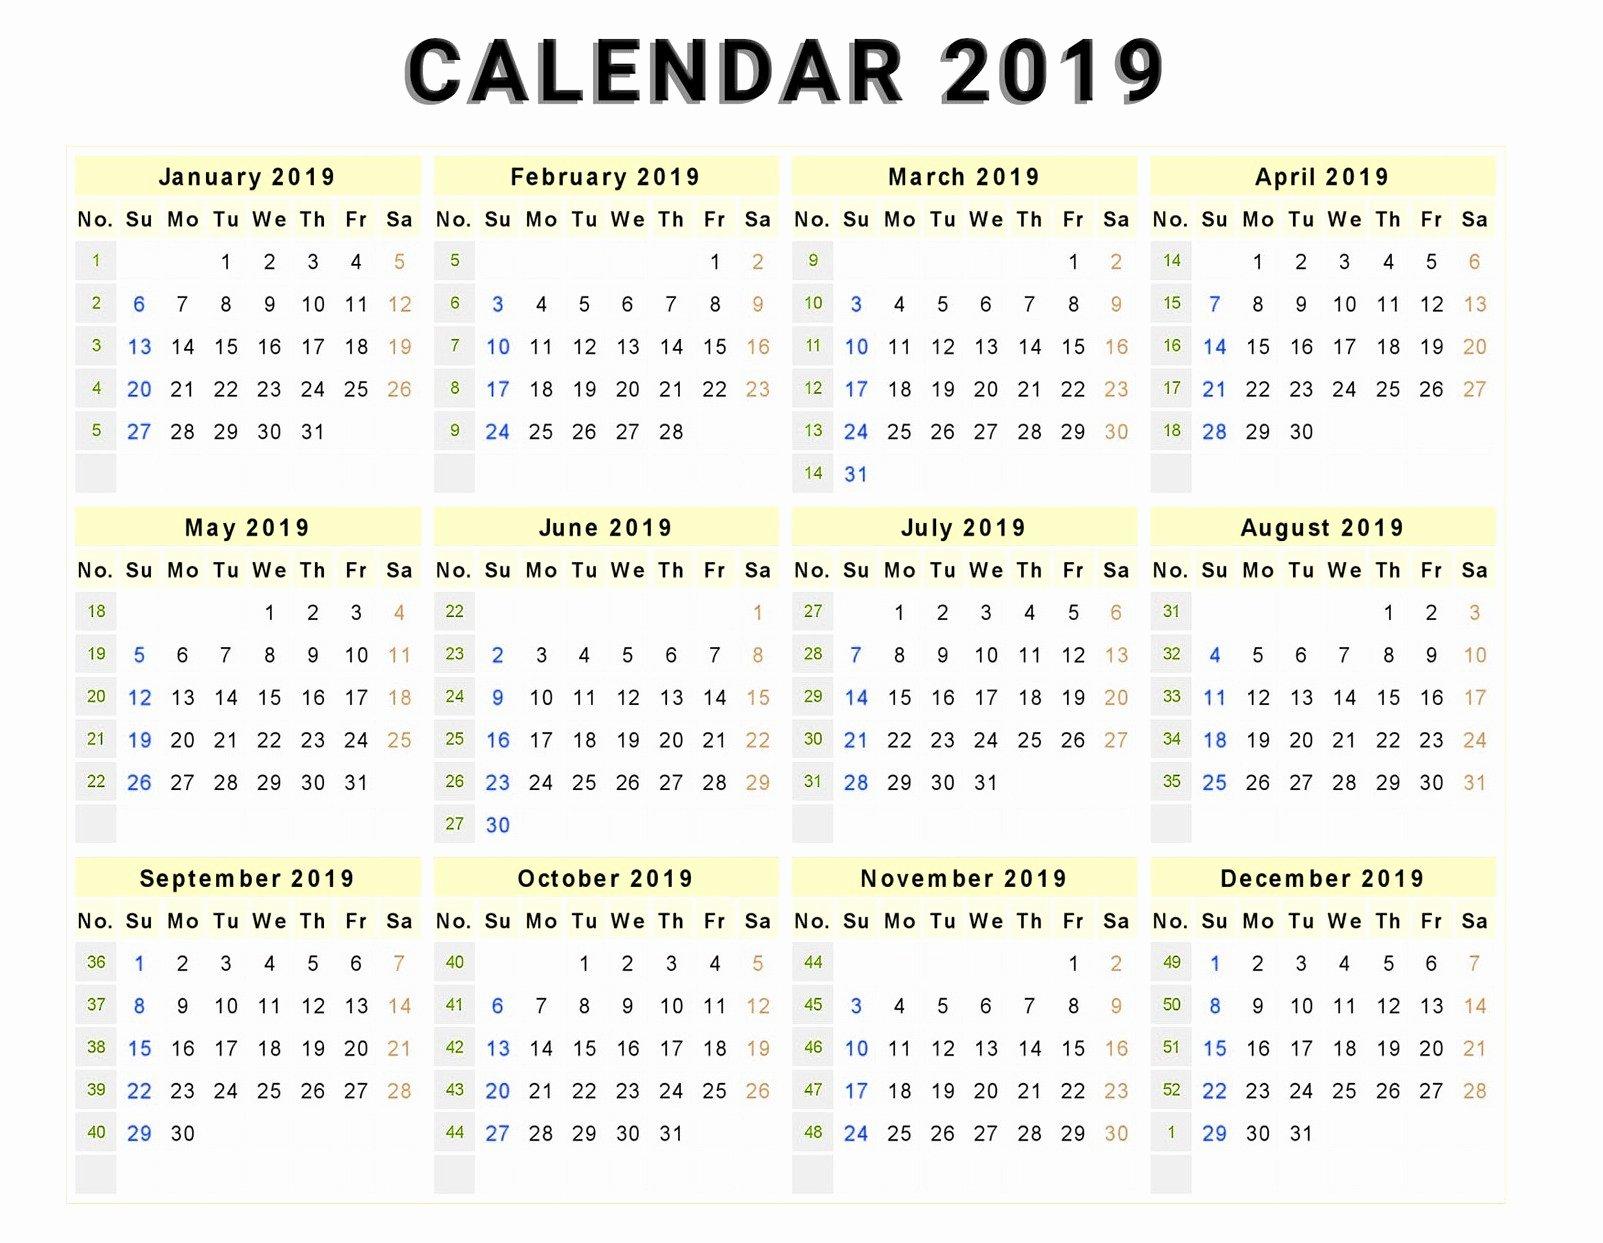 Microsoft Office Calendar Templates 2019 Elegant Calendar 2019 Print Out